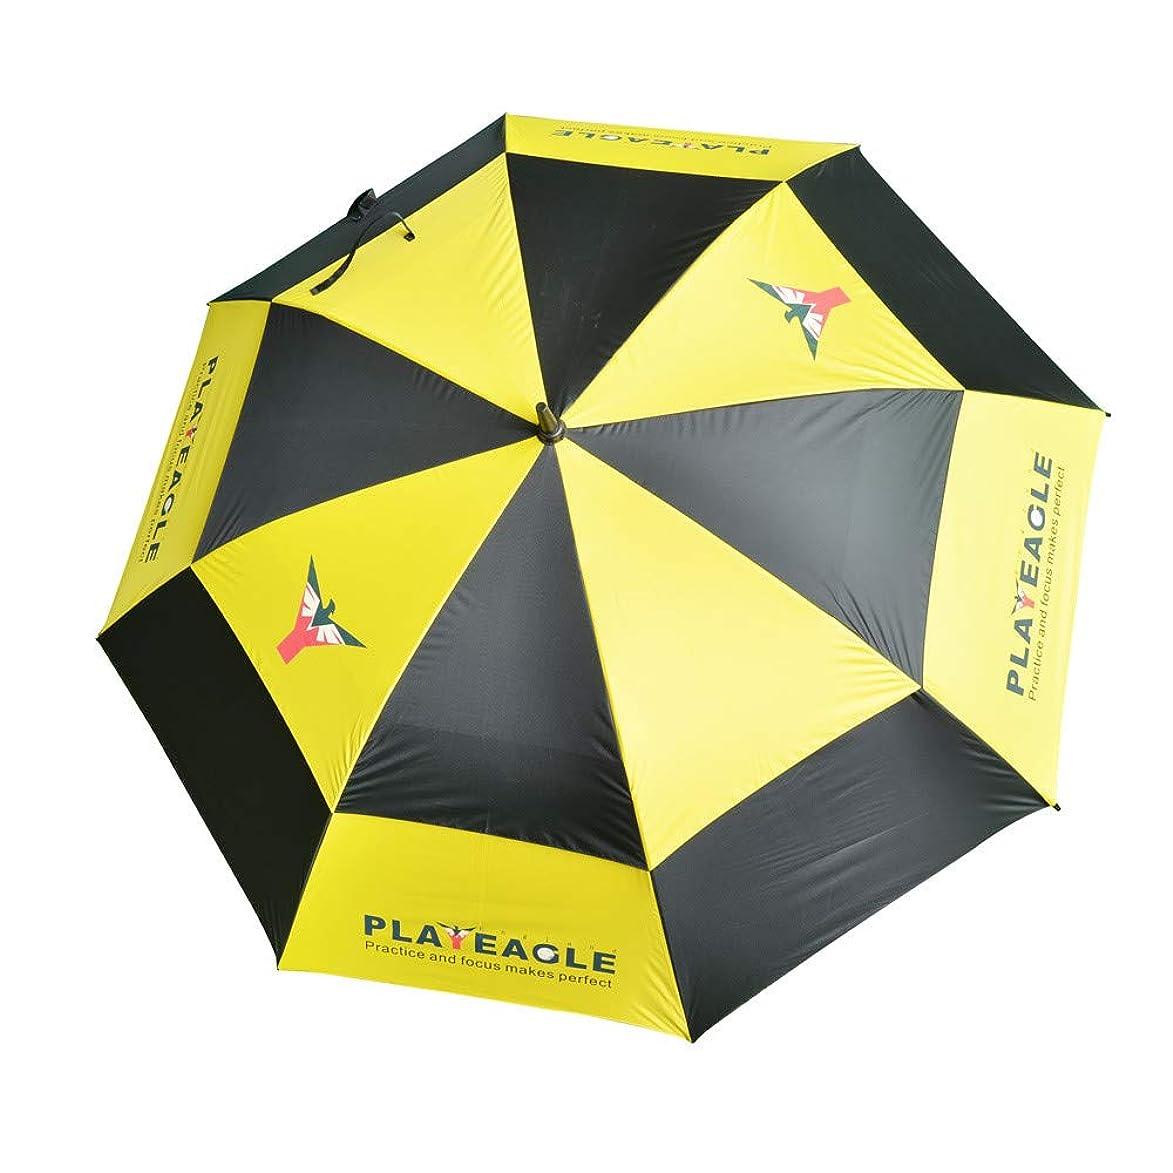 Toxz Double Nylon Canopy Golf Umbrella Anti-UV Windproof Vented Canopy Fiberglass Frame,Auto Open,Large Golf Anti-UV Umbrella